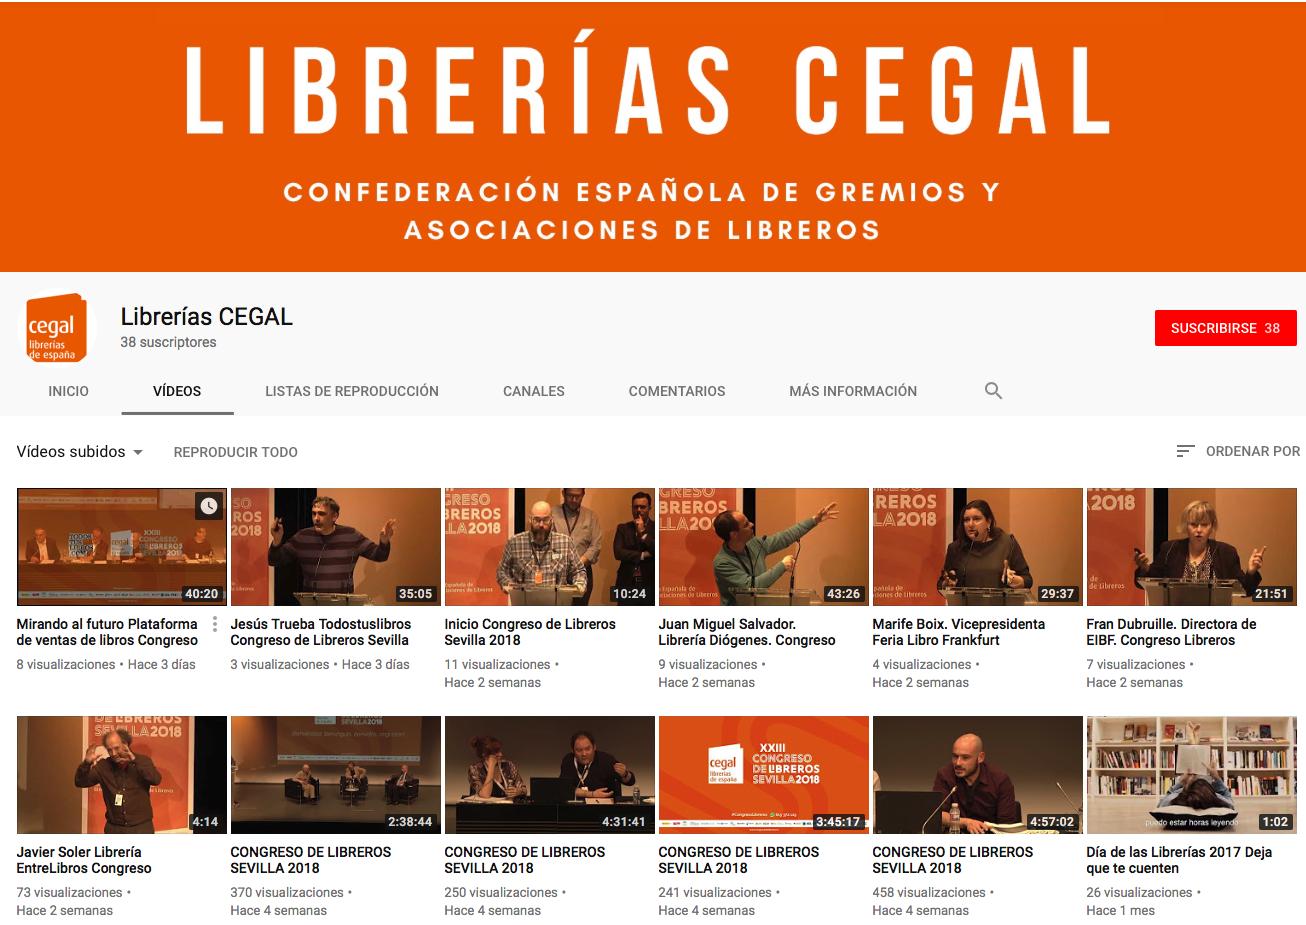 XXIII Congreso de Libreros